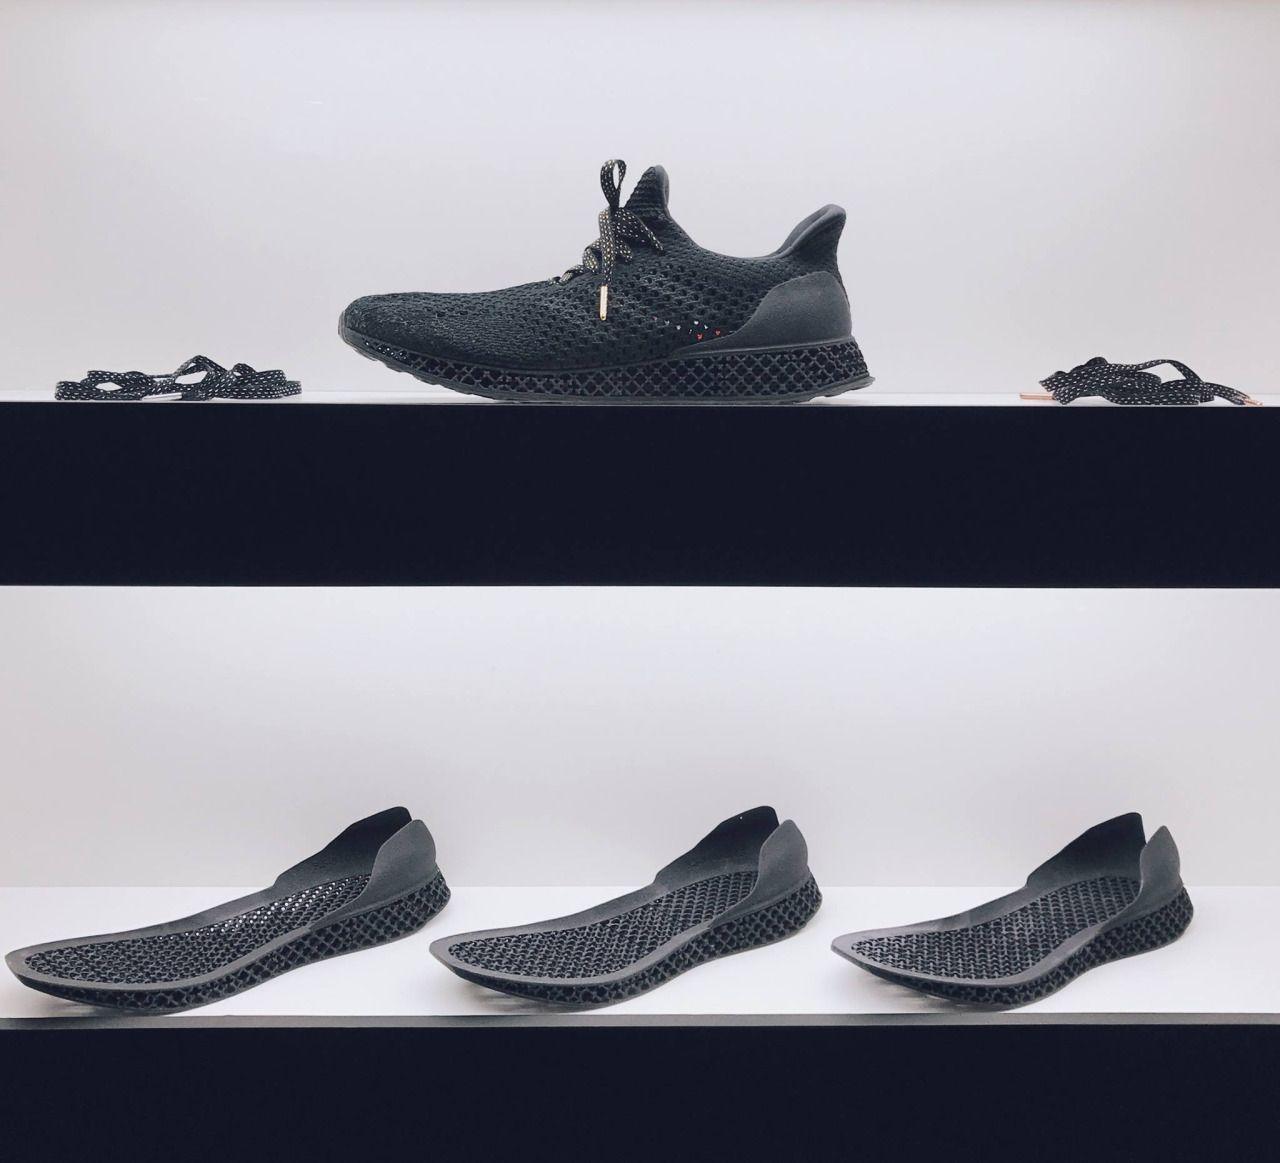 Adidas 3D Runner via sneakerb0b